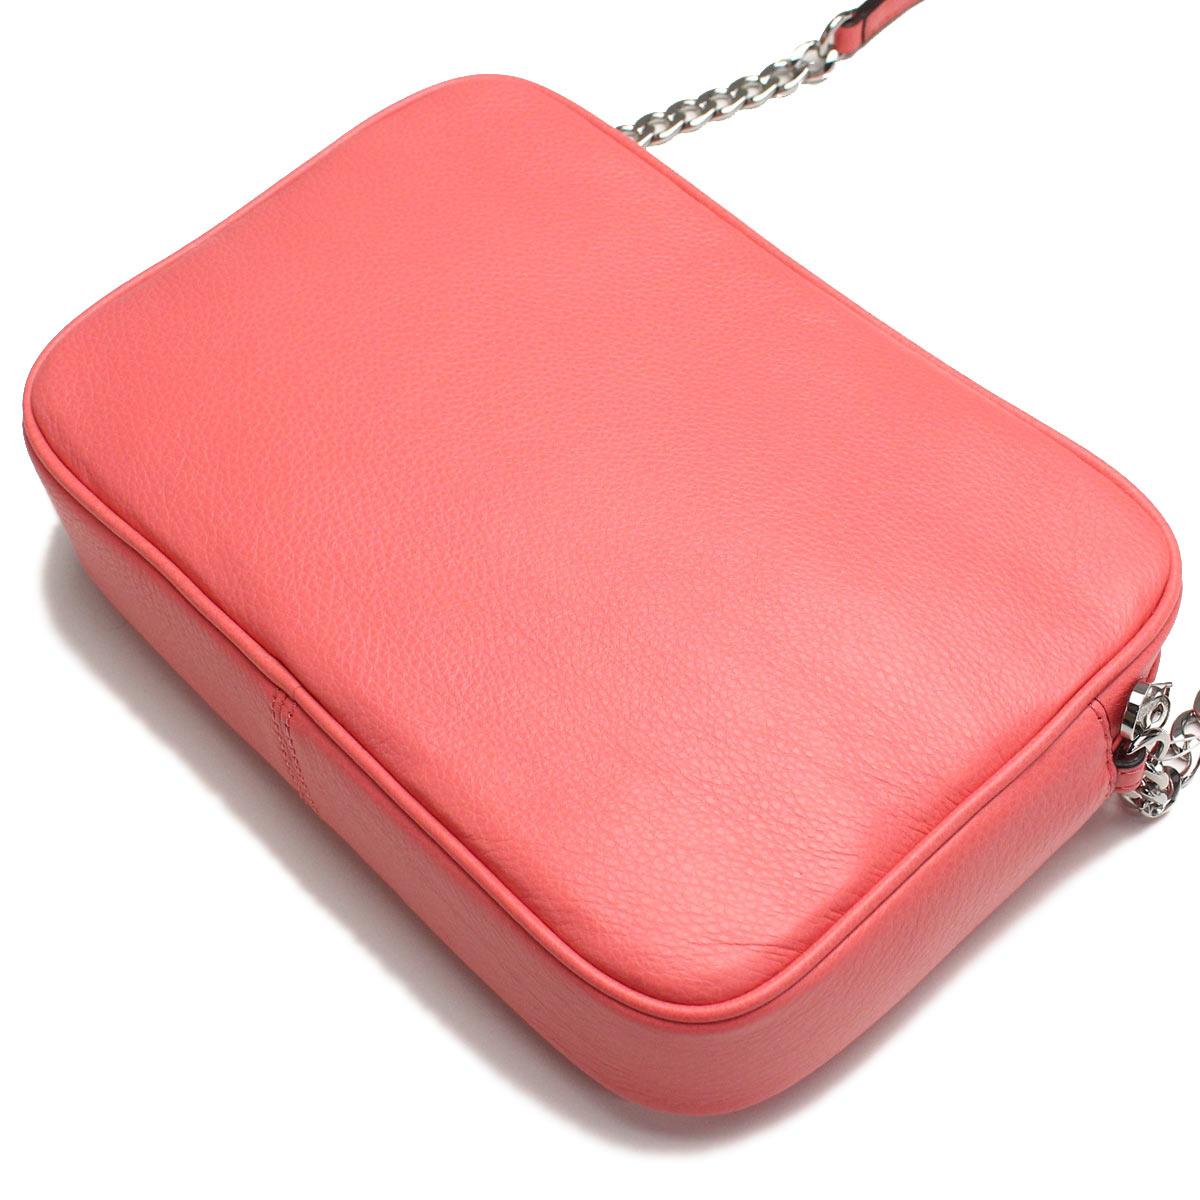 3df6d97f1e19 Michael Kors (MICHAEL KORS) BEDFORD diagonal shoulder bag 32F5SBFC3L CORAL  pink( taxfree send by EMS authentic A brand new item )